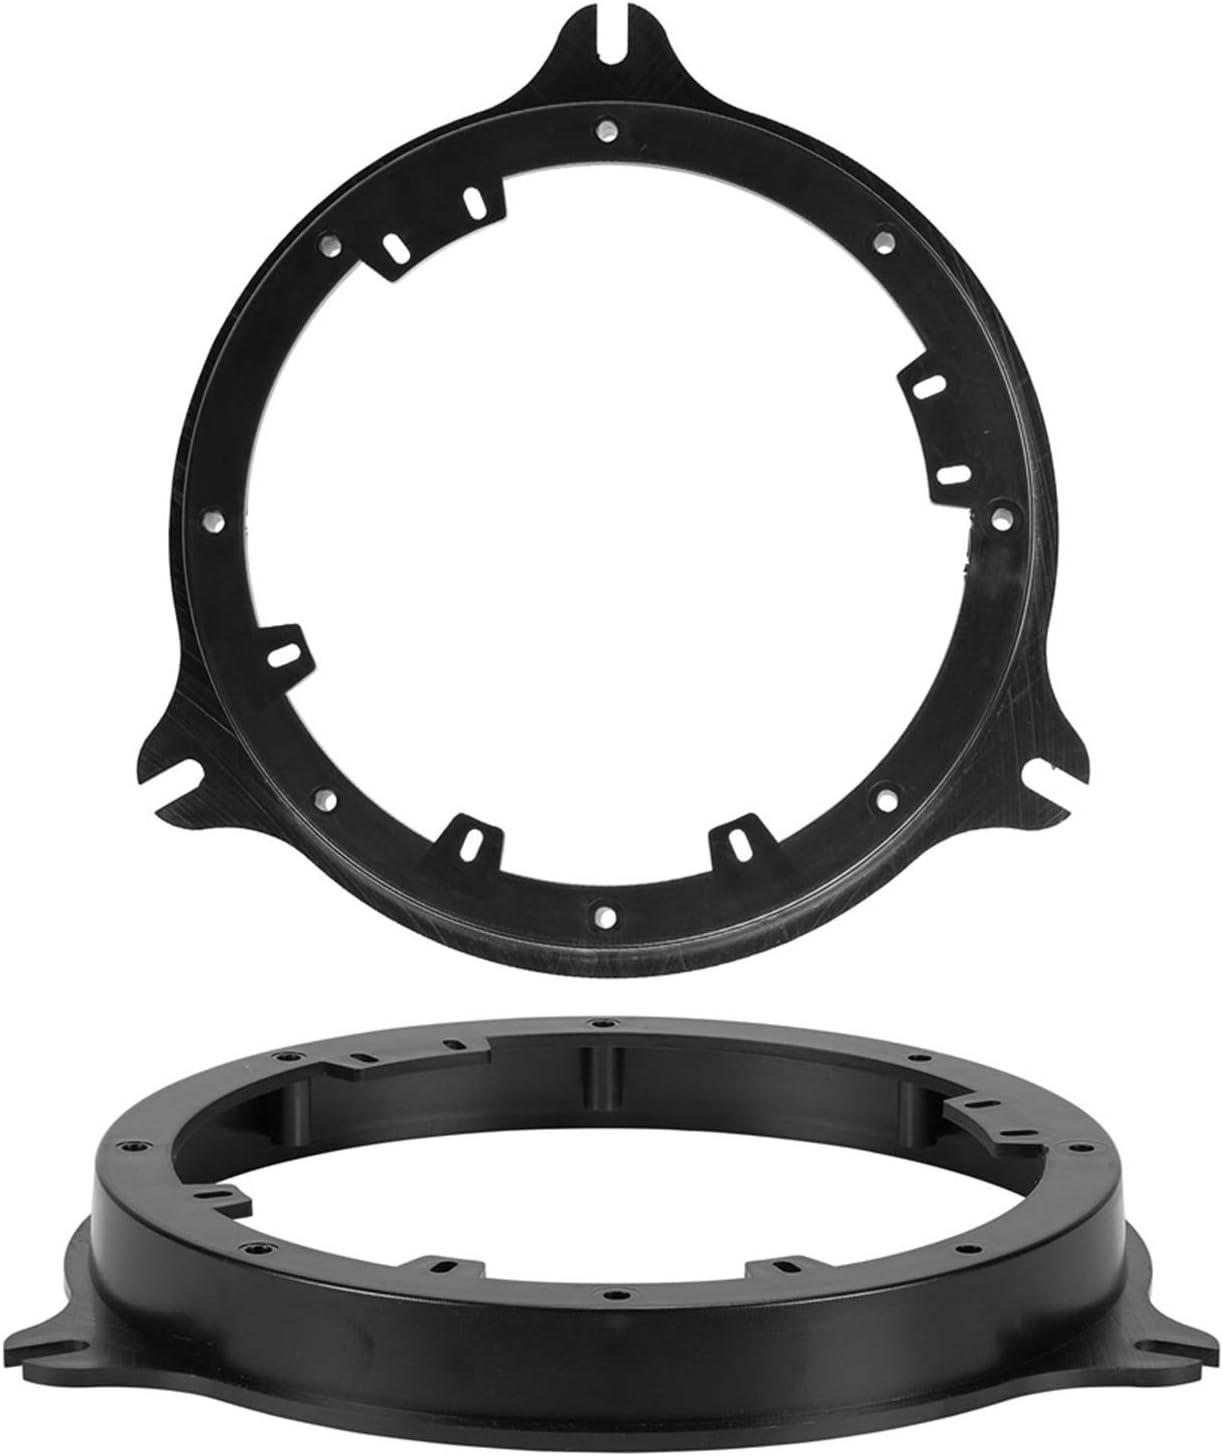 Metra 10-10 Speaker Adapter for Nissan/Infiniti Vehicles